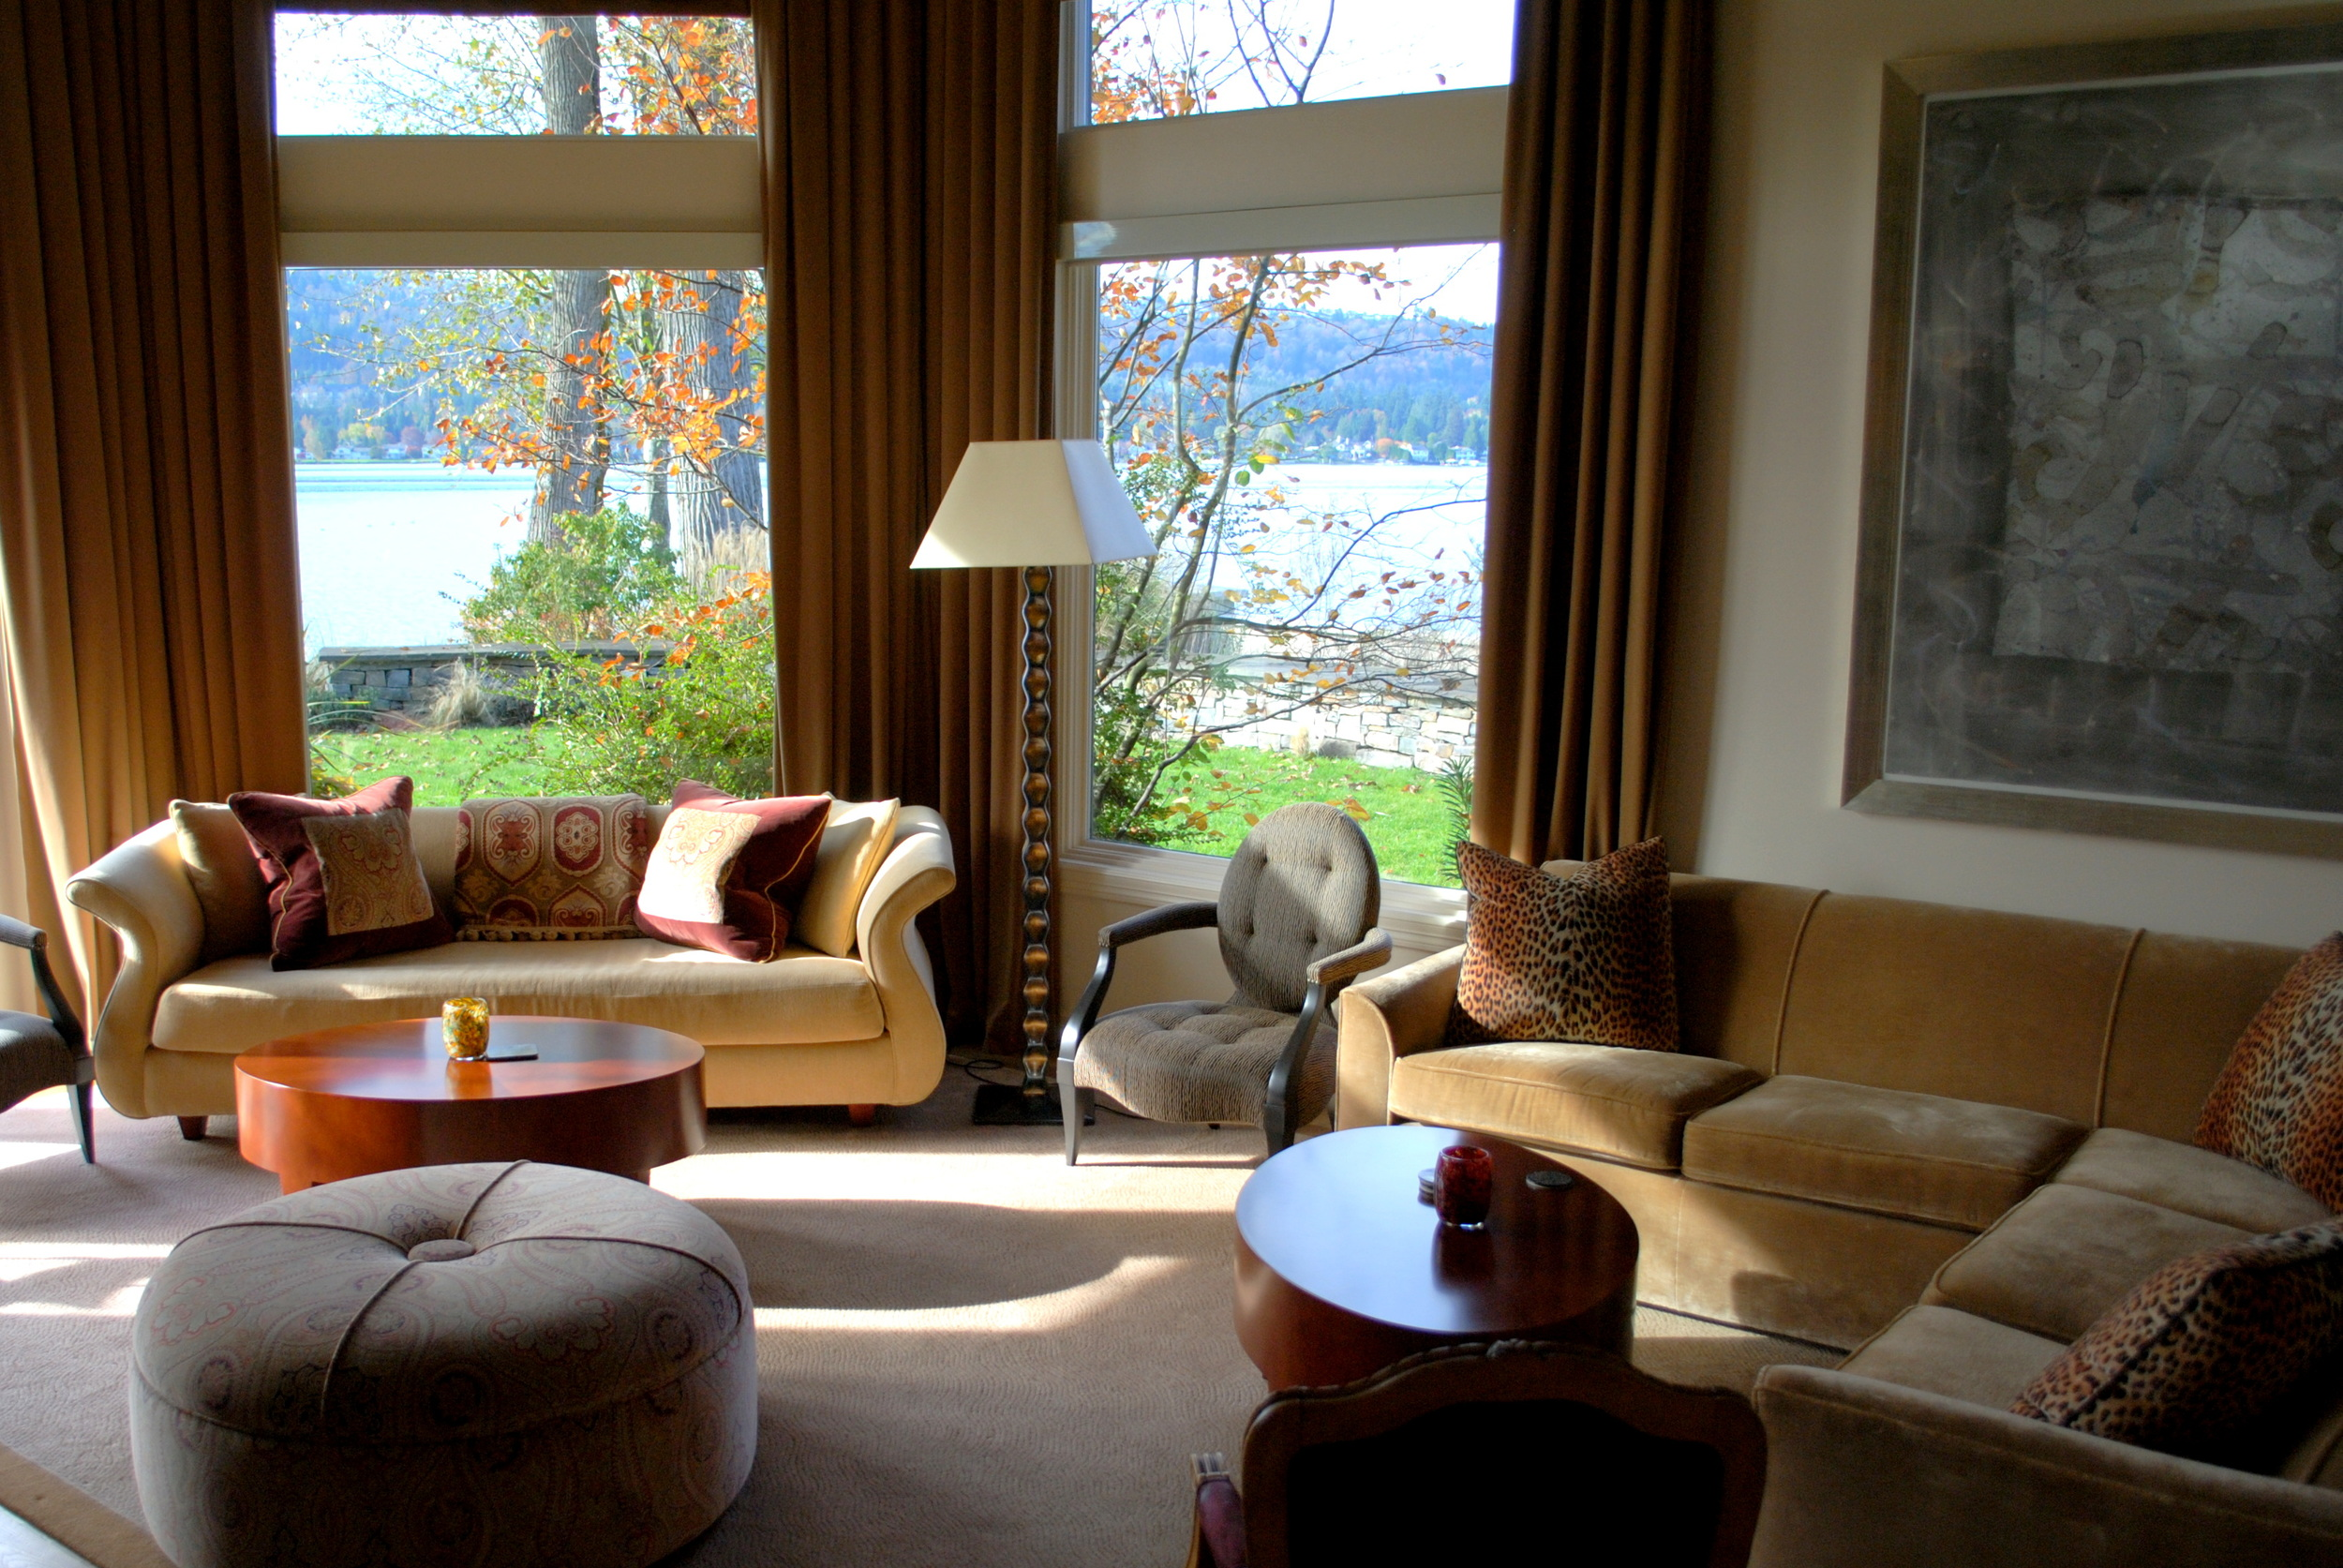 Lake Sammamish, Washington